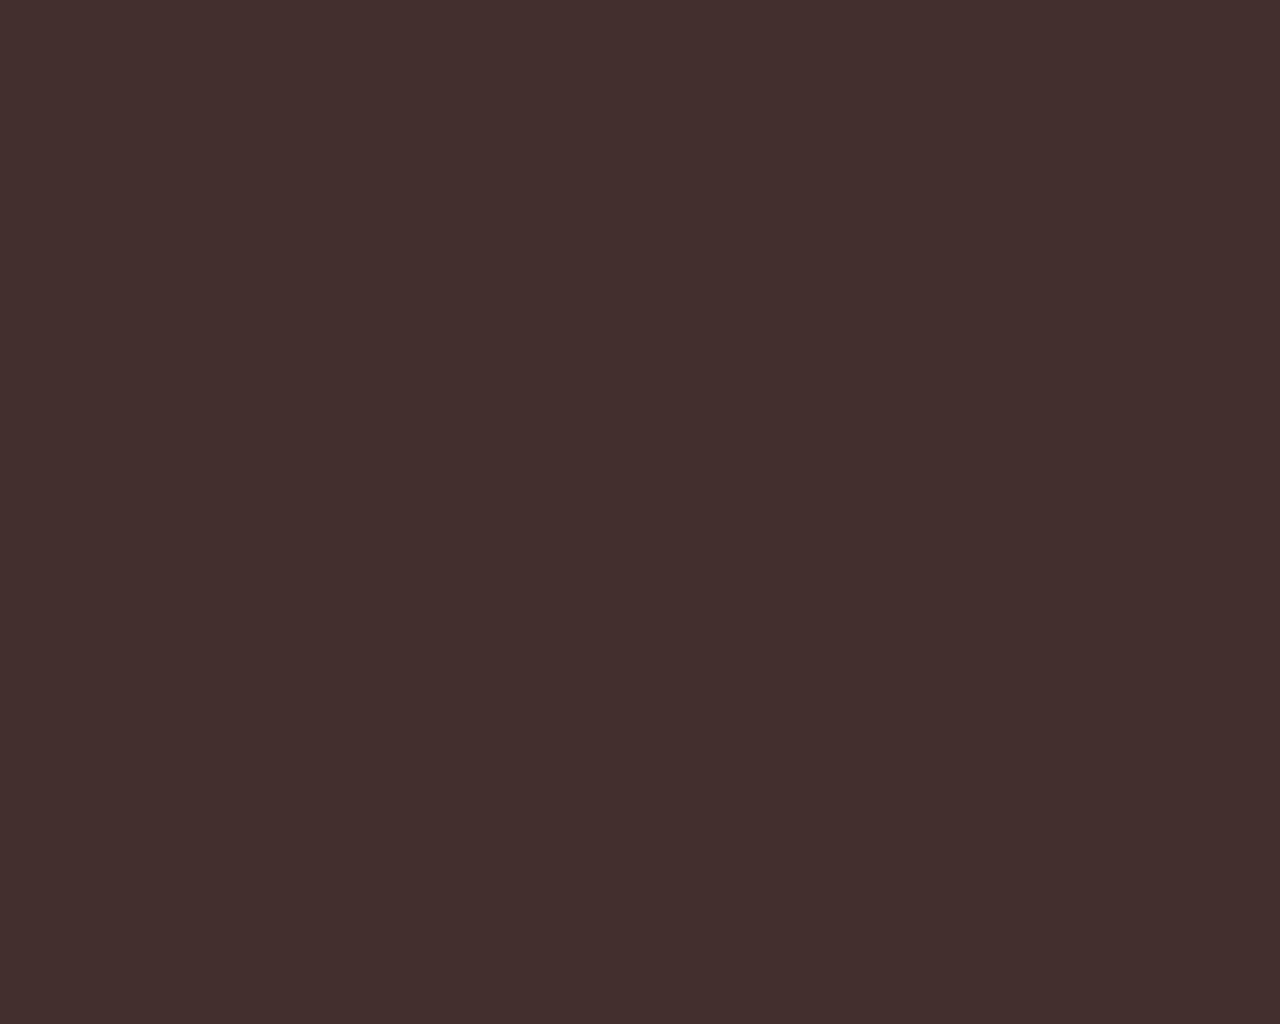 1280x1024 Old Burgundy Solid Color Background